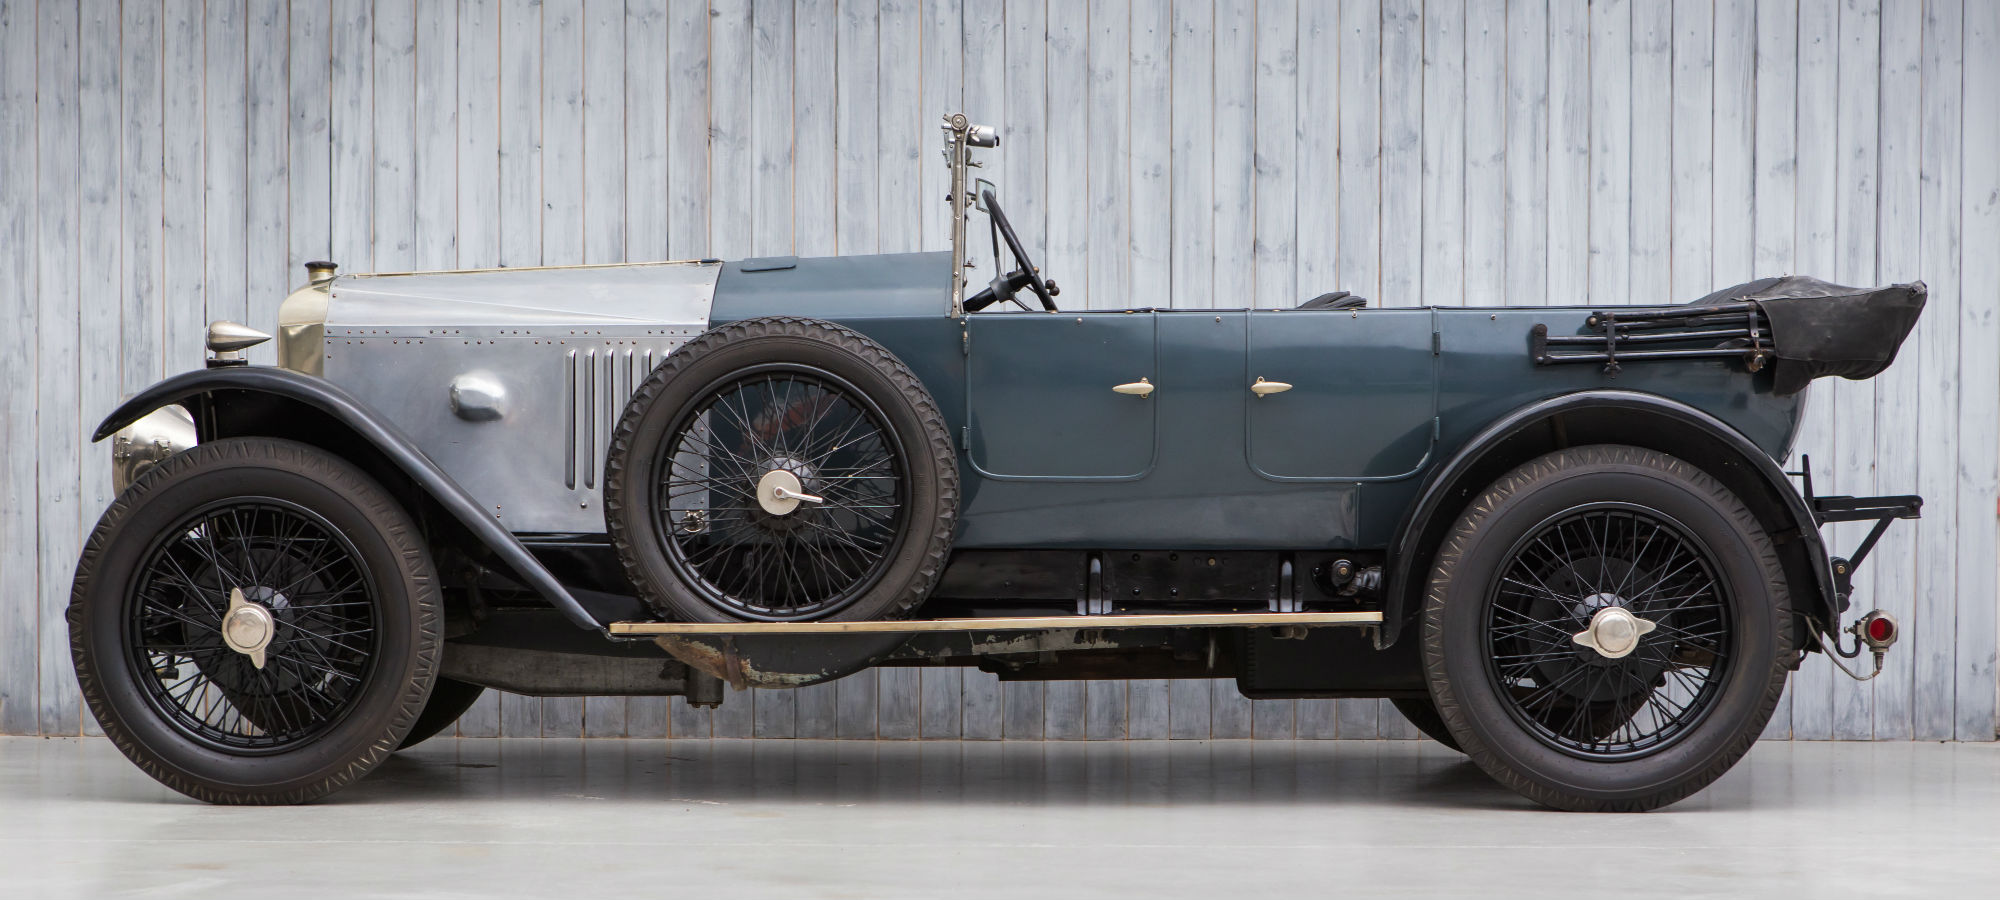 The Ex - Humphrey Milling 1924 Vauxhall 30-98 Velox Tourer